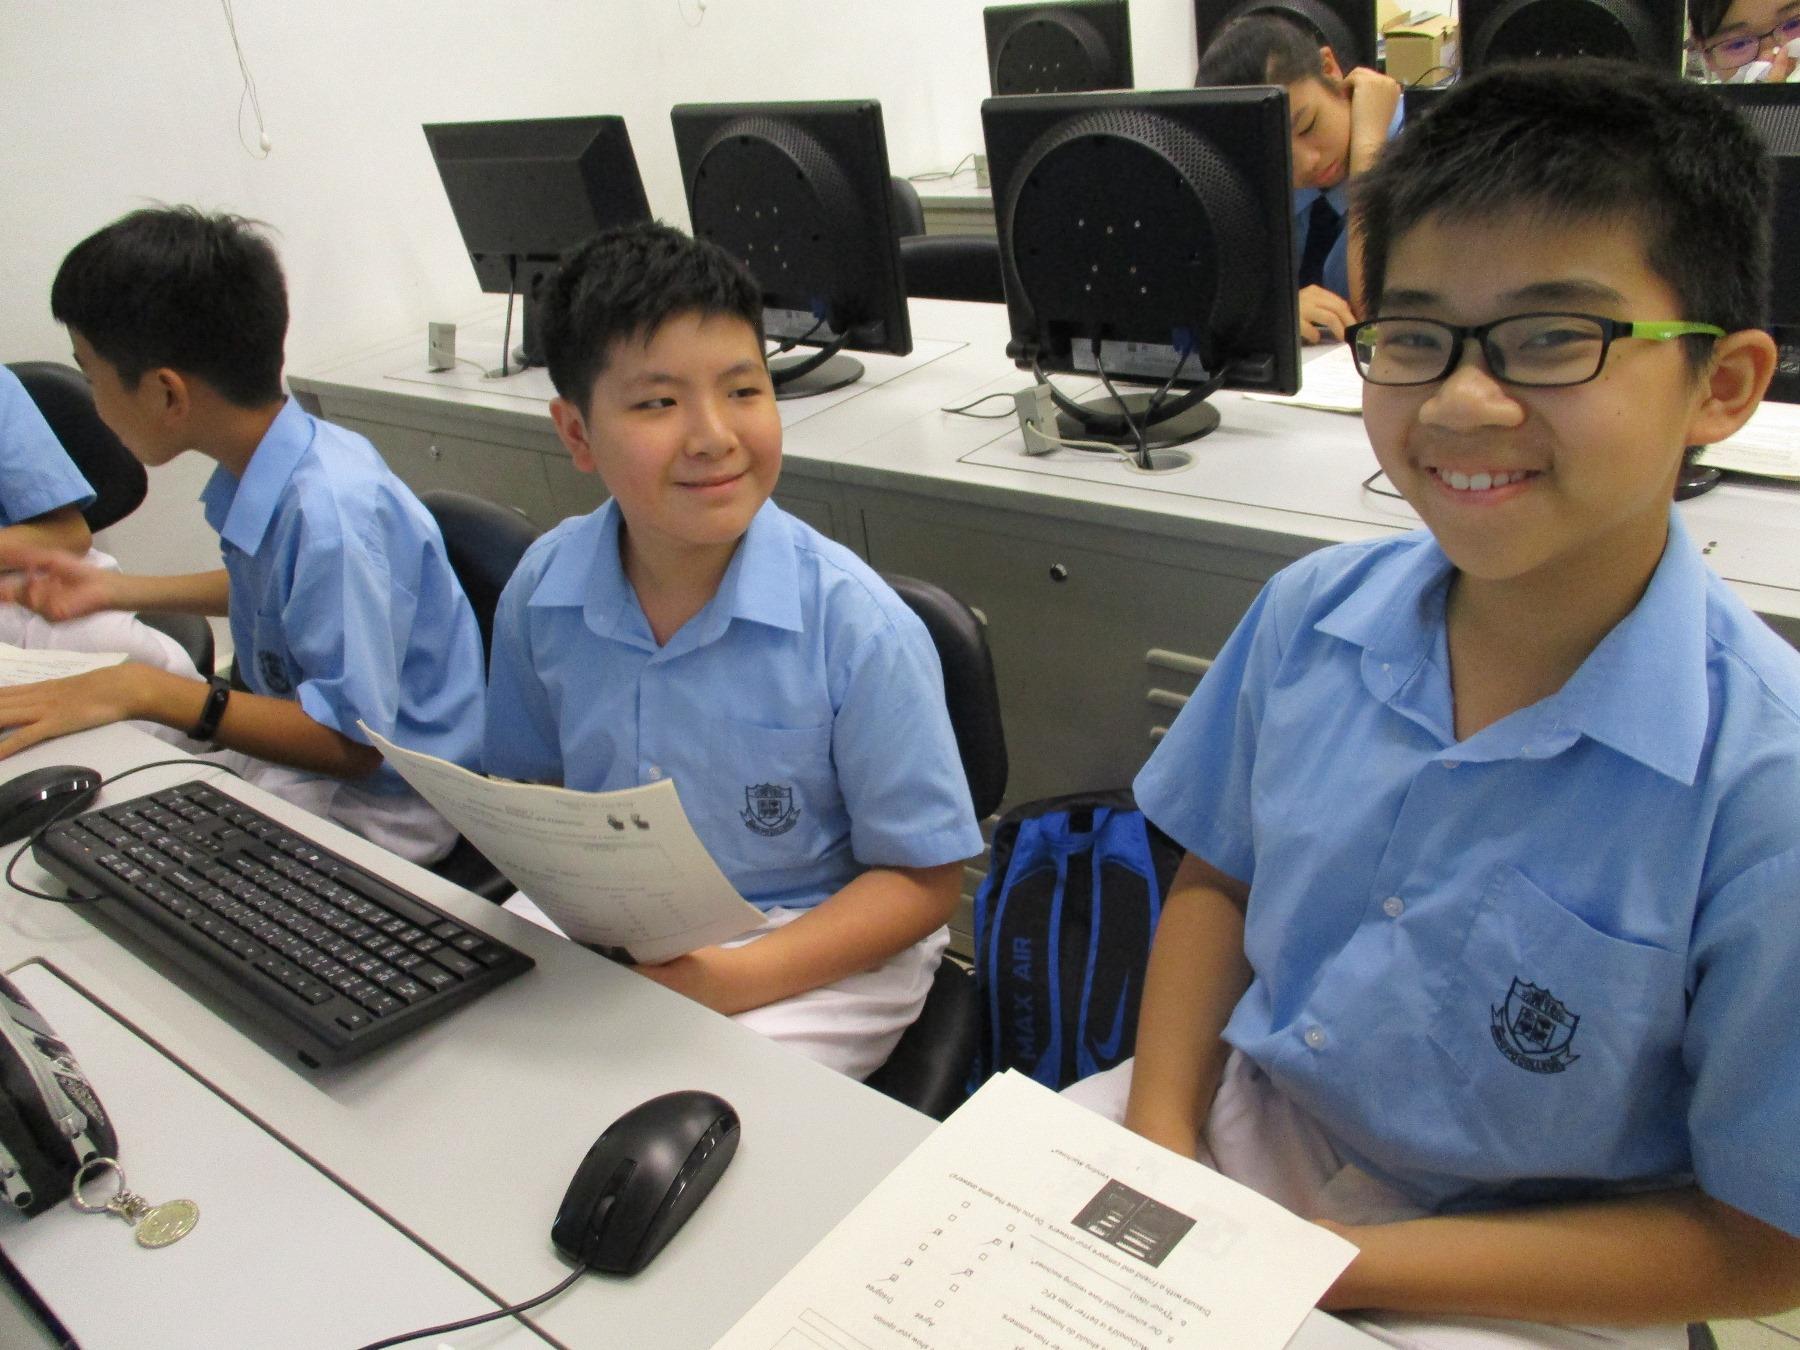 http://www.npc.edu.hk/sites/default/files/img_0150.jpg